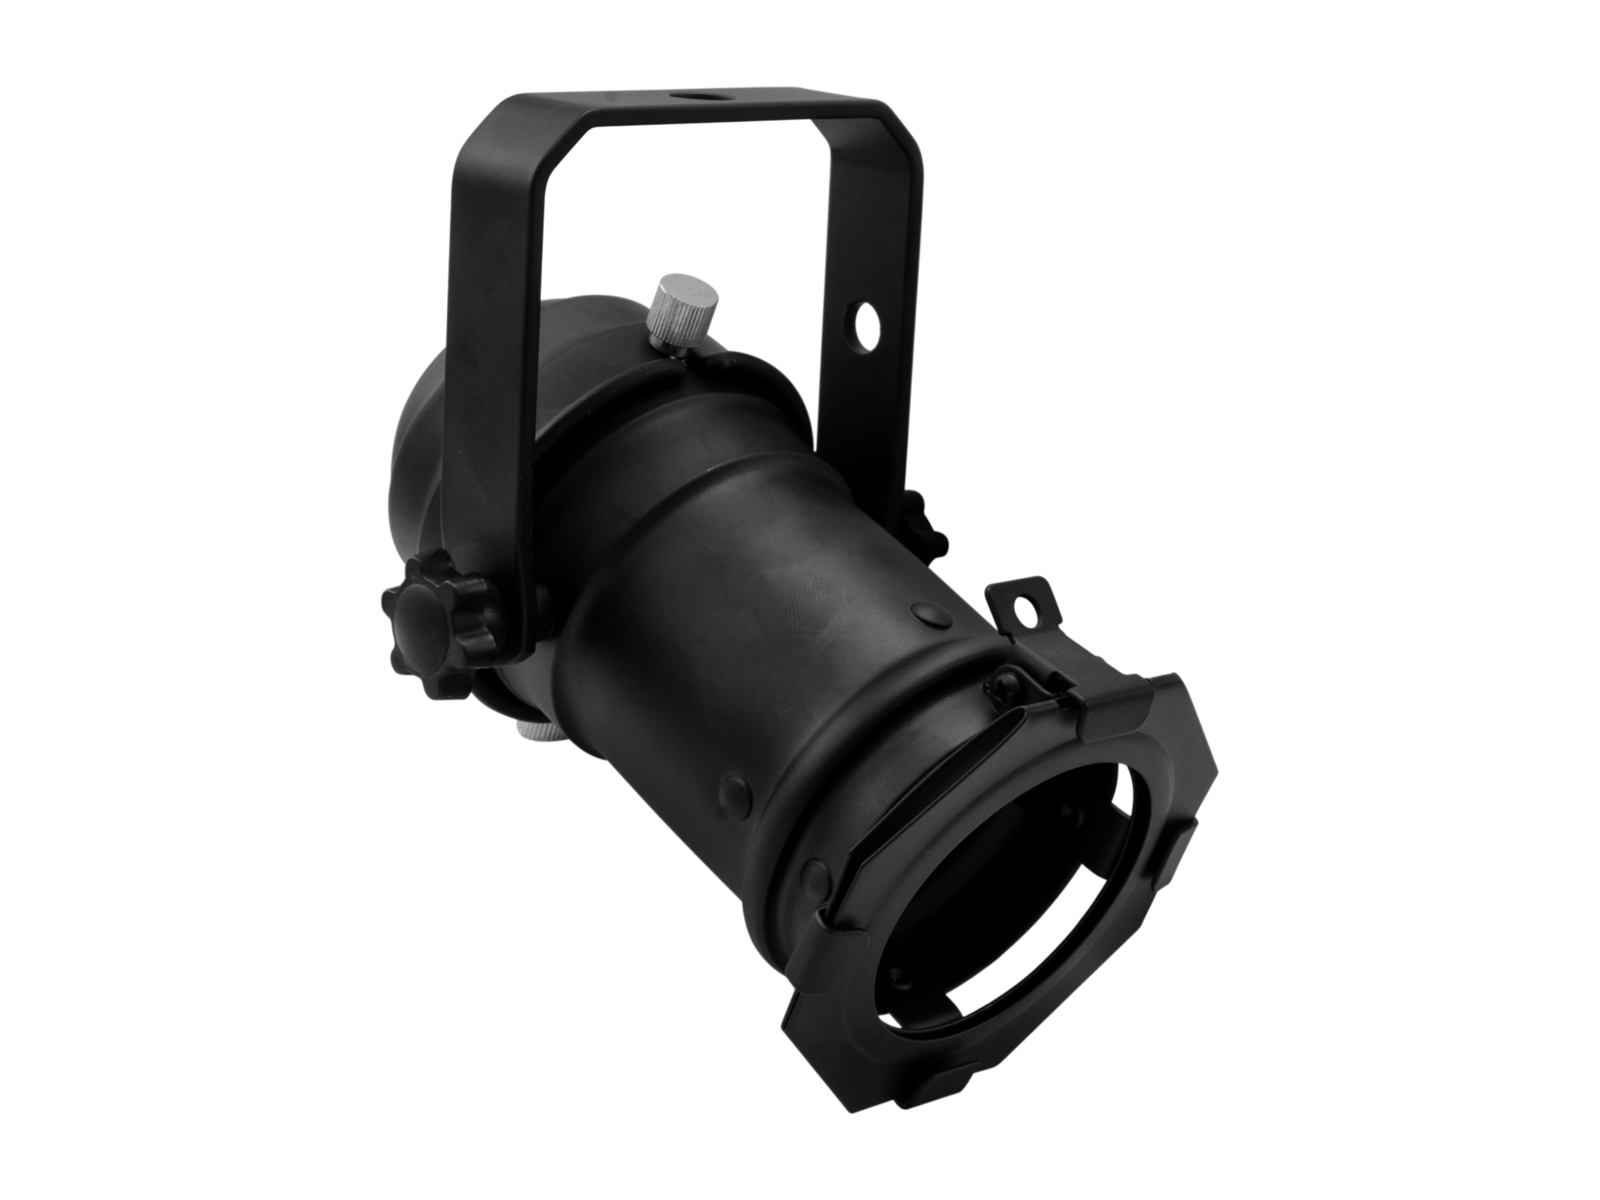 EUROLITE Set PAR-16 Spot GU-10 schwarz + GU-10 230V LED SMD 7W 3000K